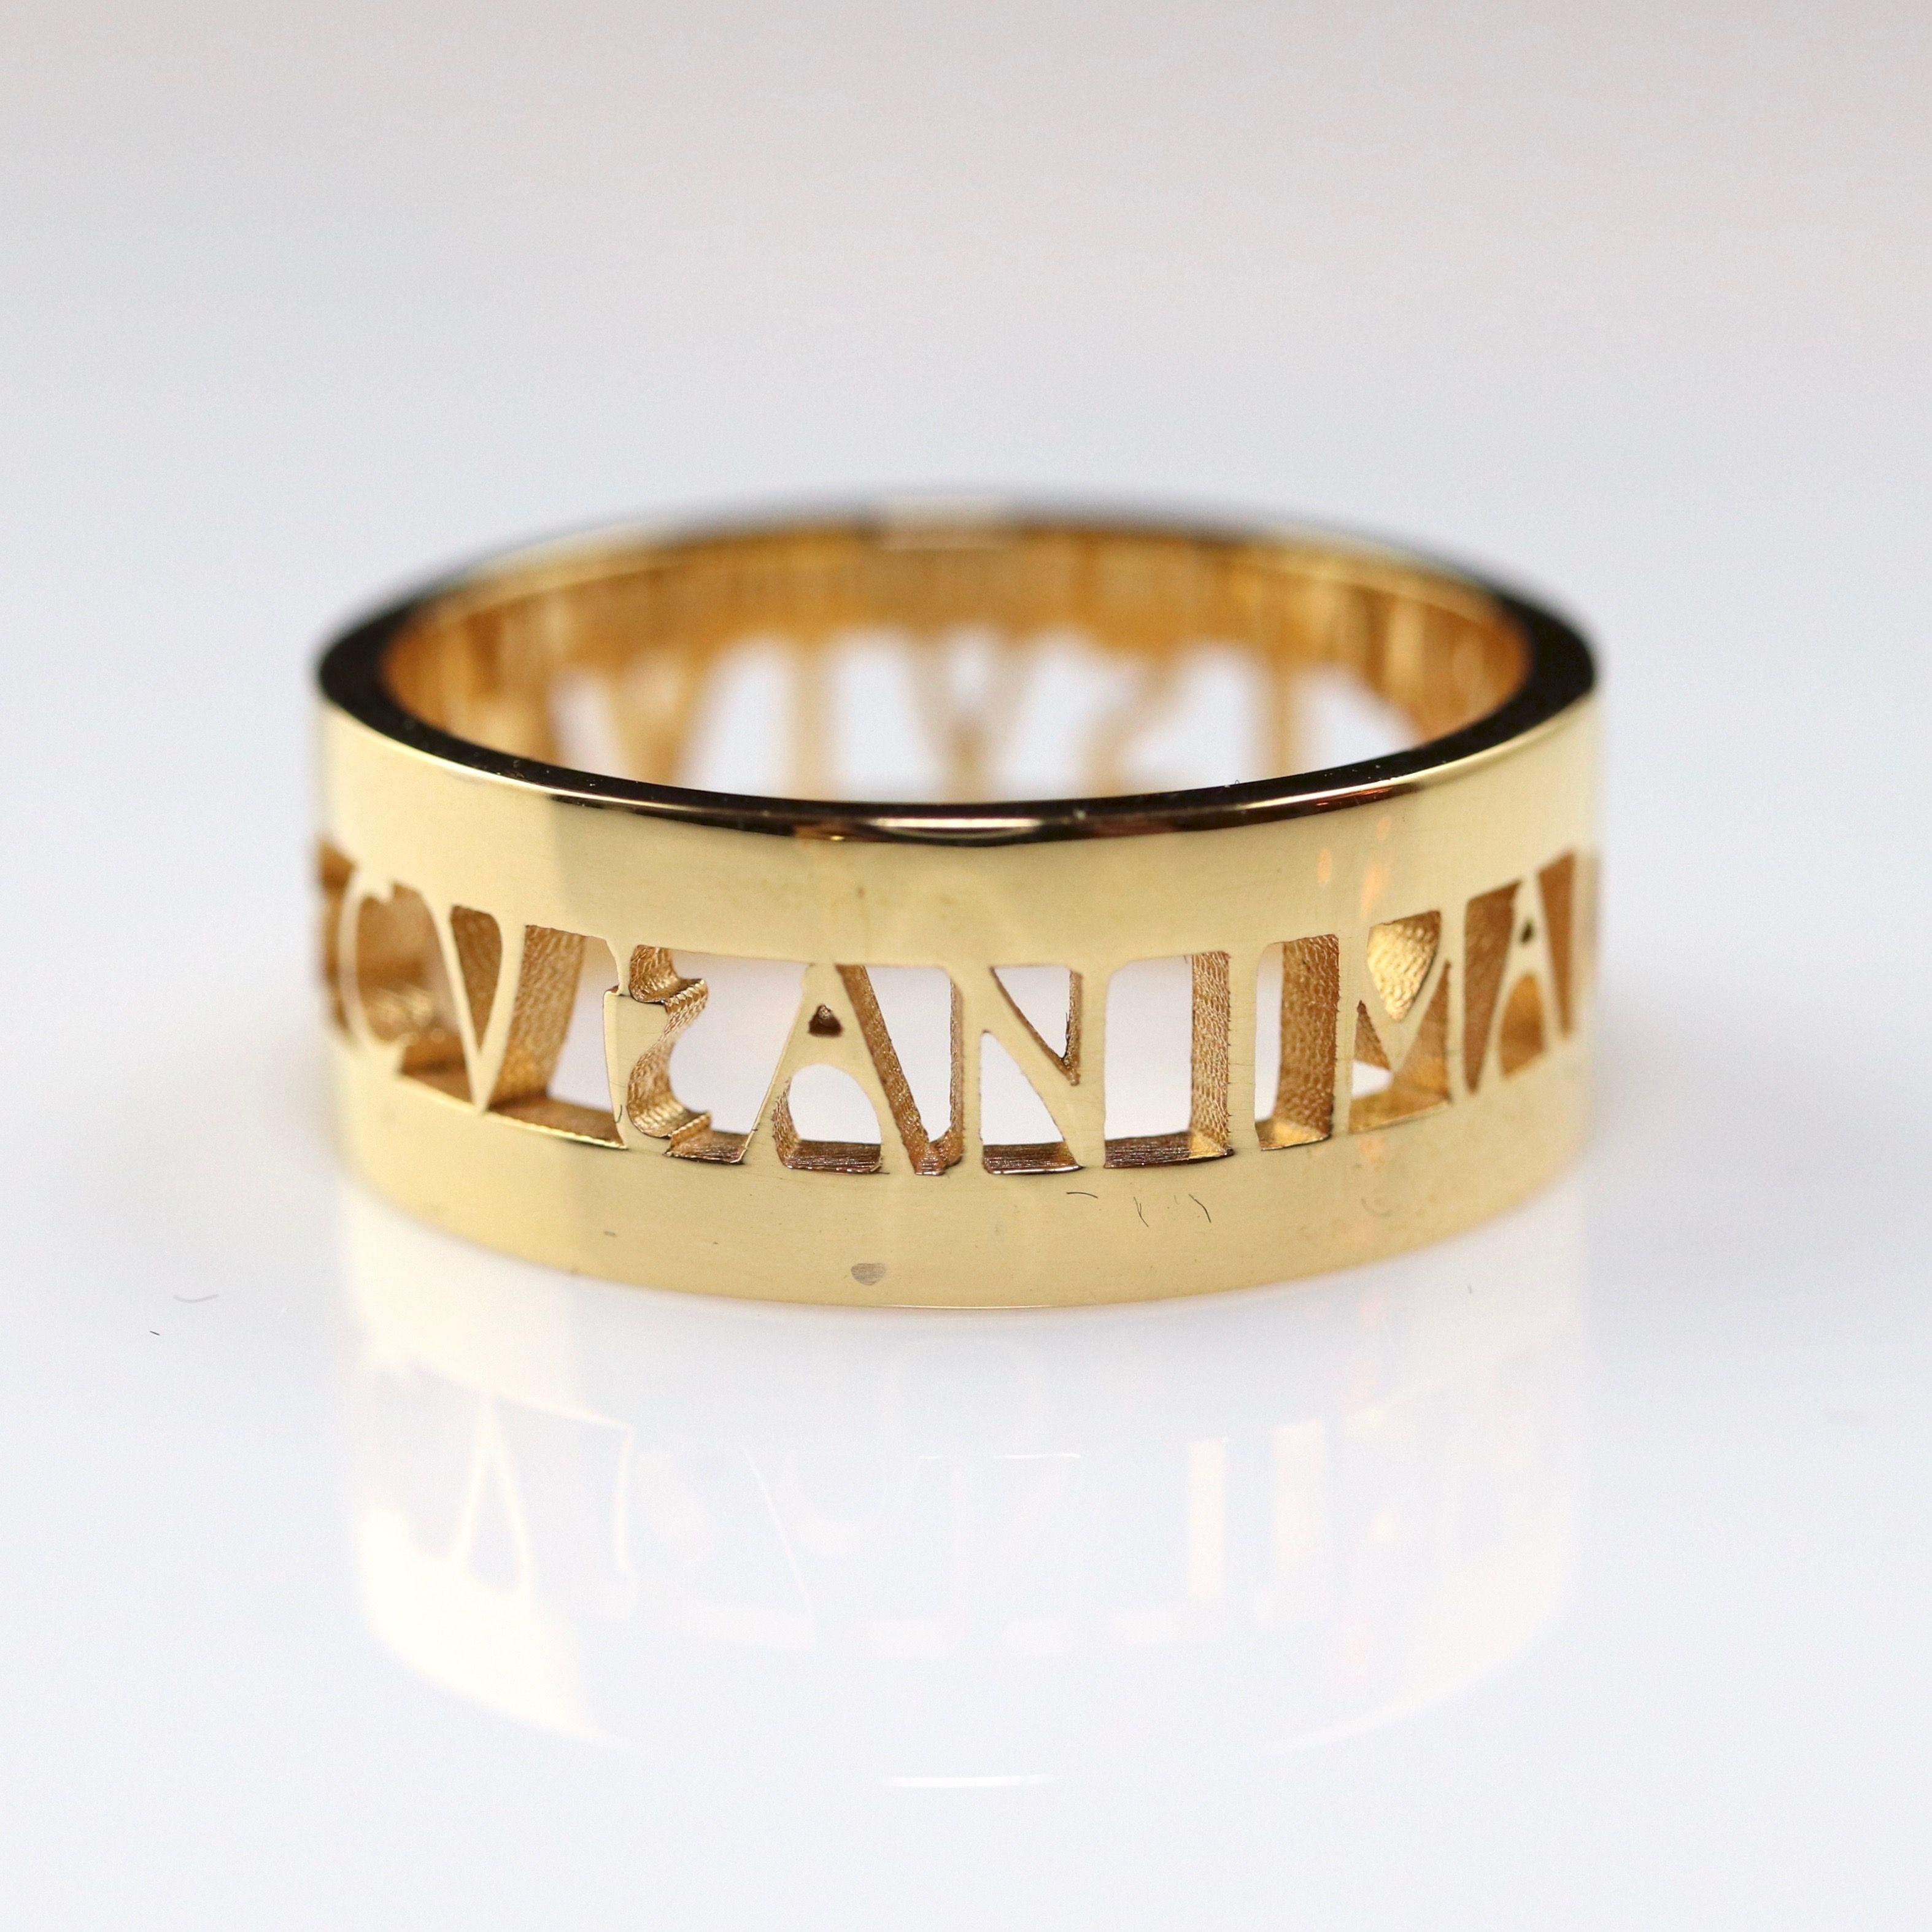 Anima Roman Ring Gold Gold Rings Jewelry Jewelry Design